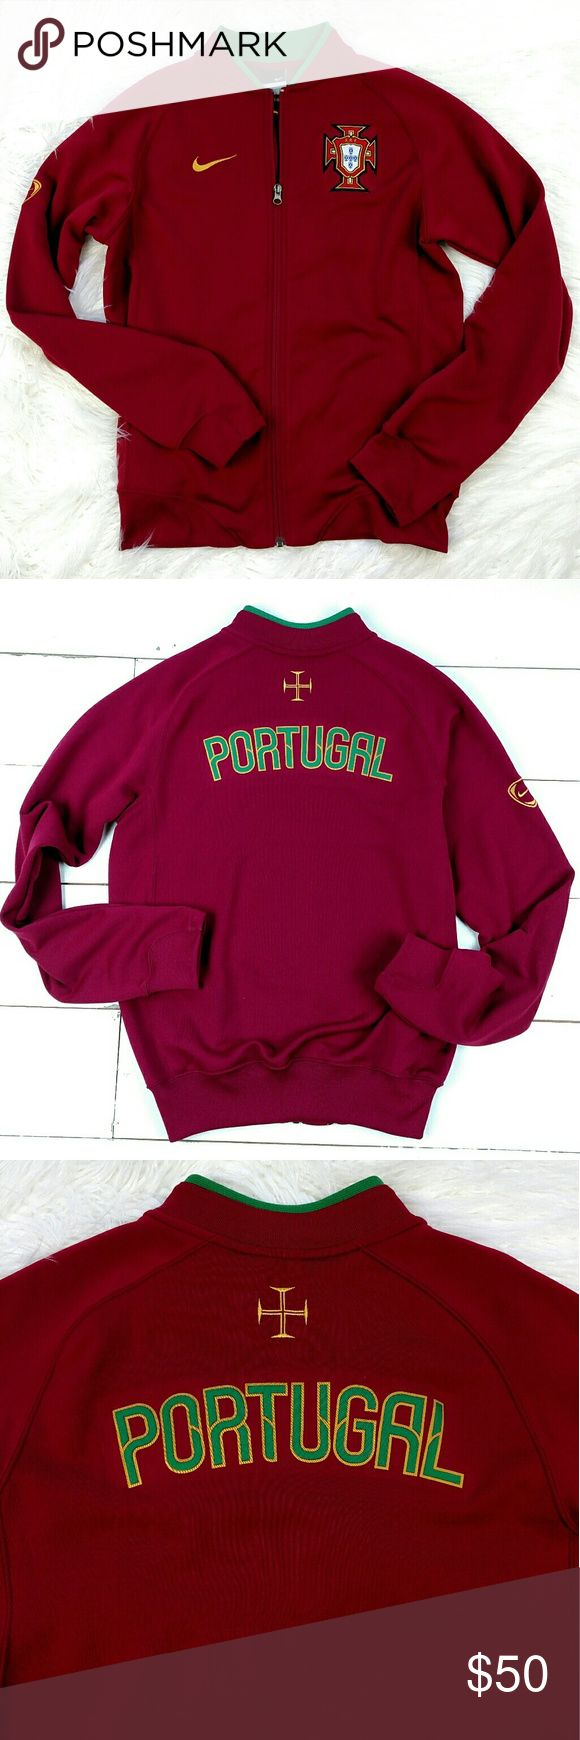 "Nike Portugal Soccer Warm-Up Zip Jacket Portugal soccer warm-up full zip jacket. 20"" armpit to armpit and 24"" shoulder to hem. No trades! EUC Nike Jackets & Coats"